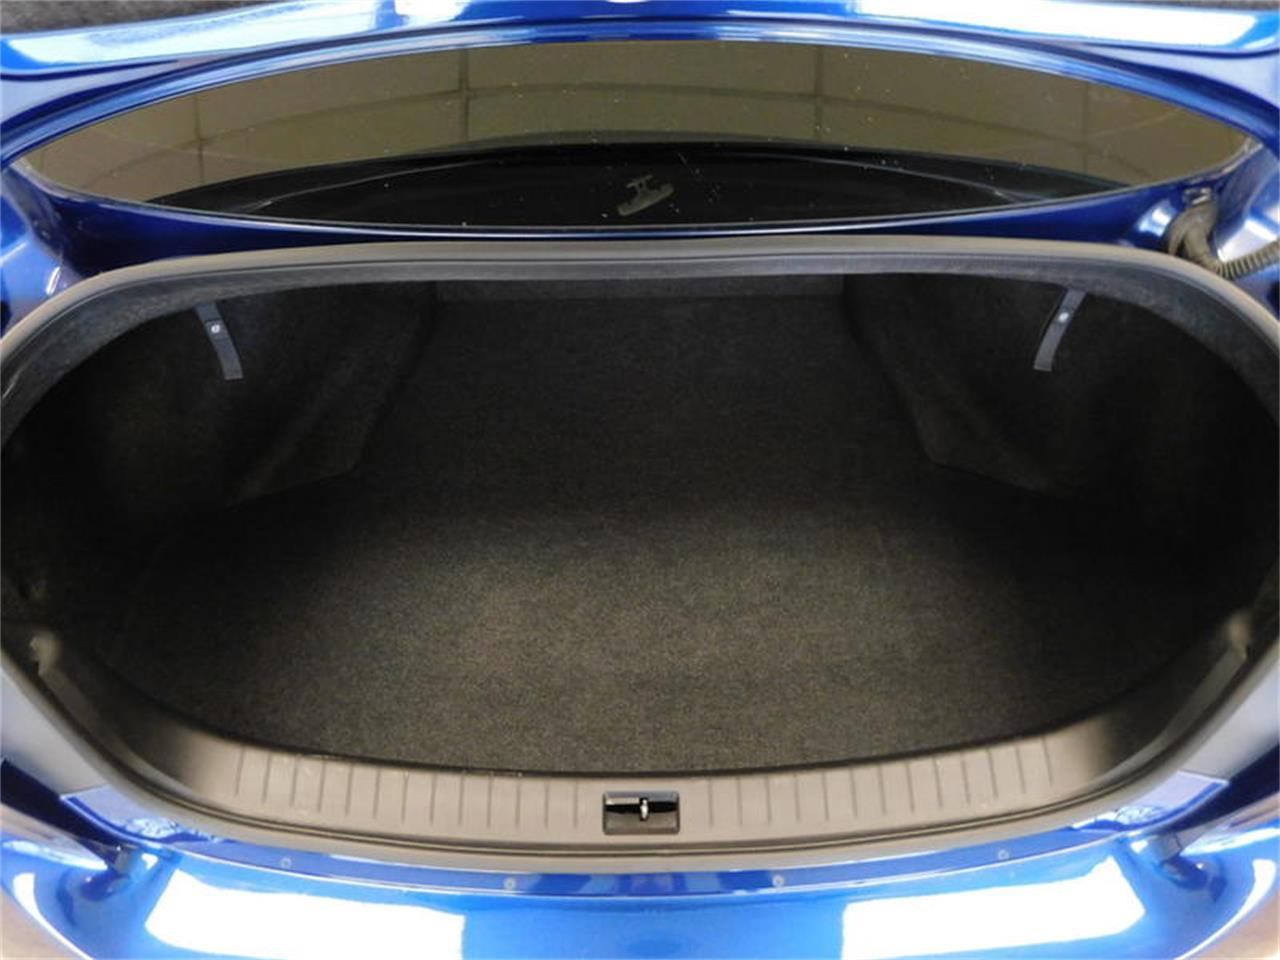 2017 Infiniti Q50 (CC-1192522) for sale in Hamburg, New York